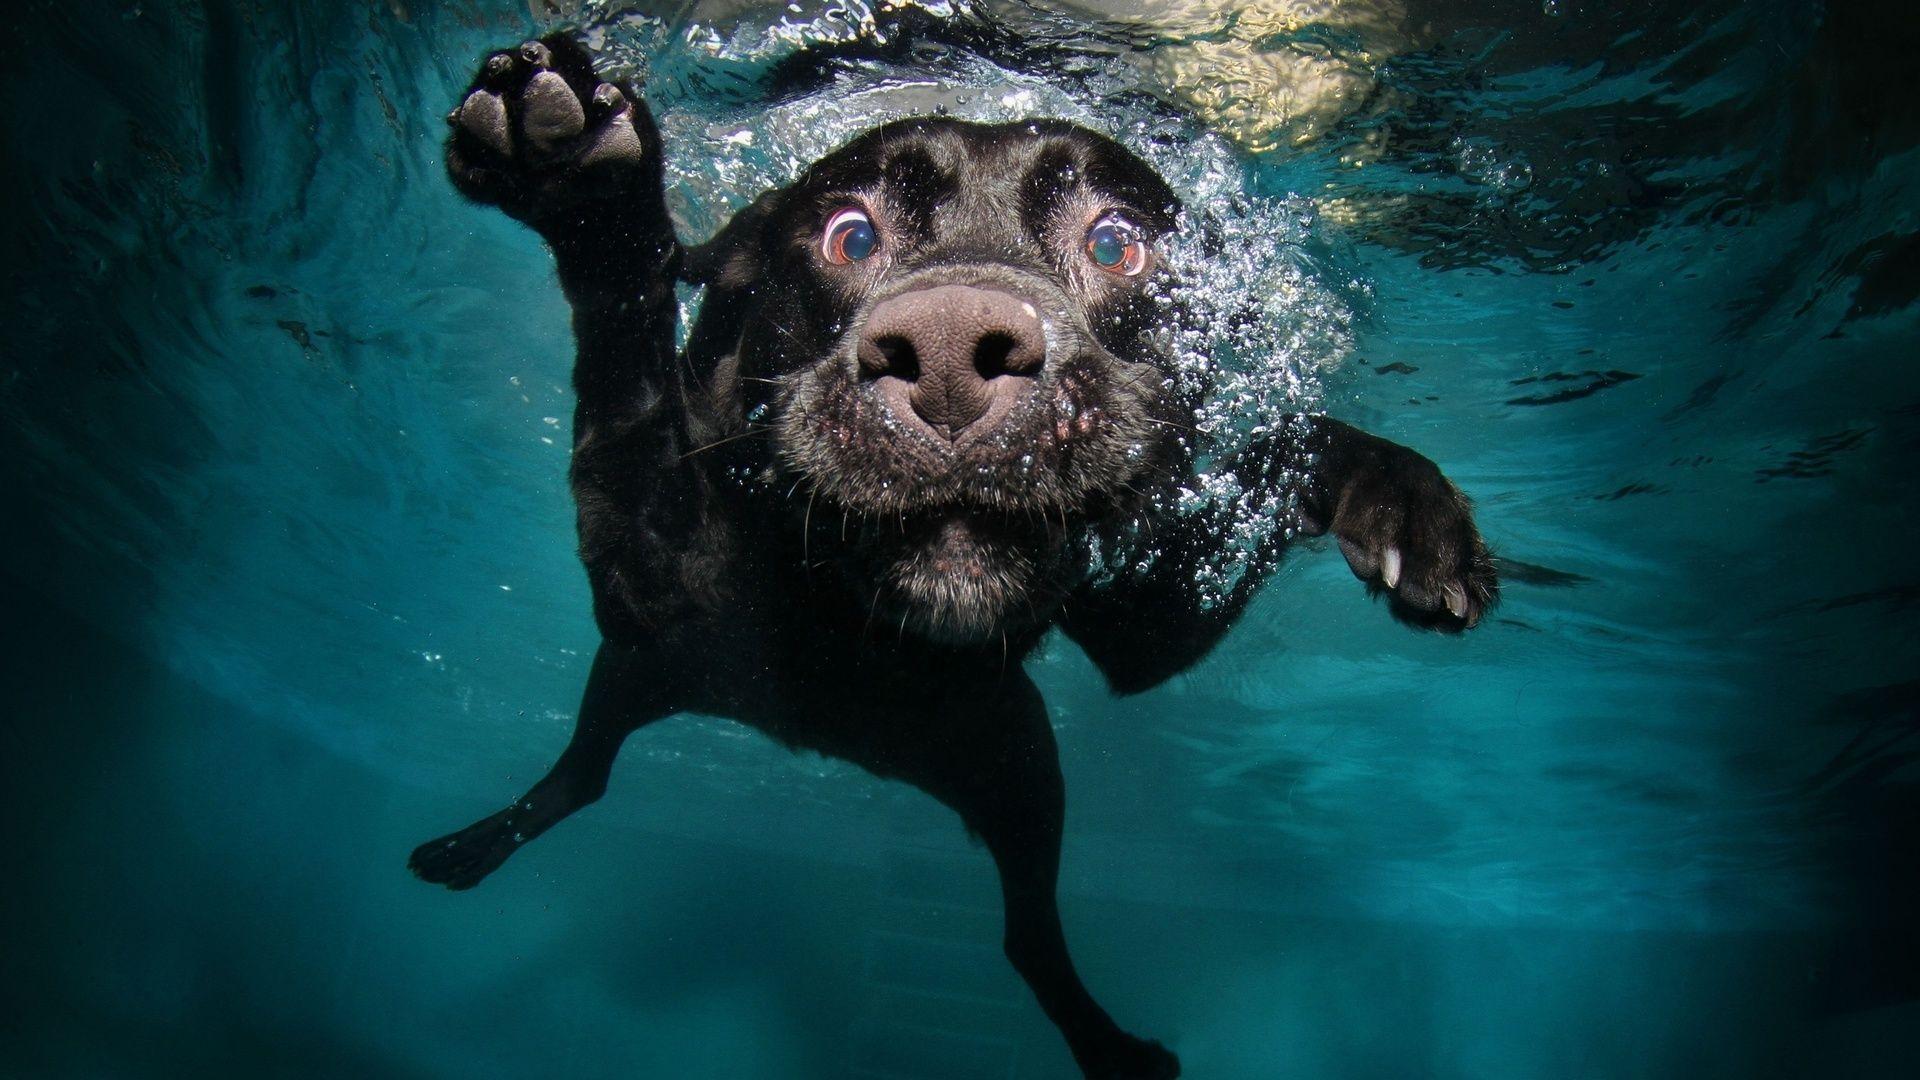 Hd wallpaper underwater - Underwater Dogs Wallpaper Hd Wallpaper